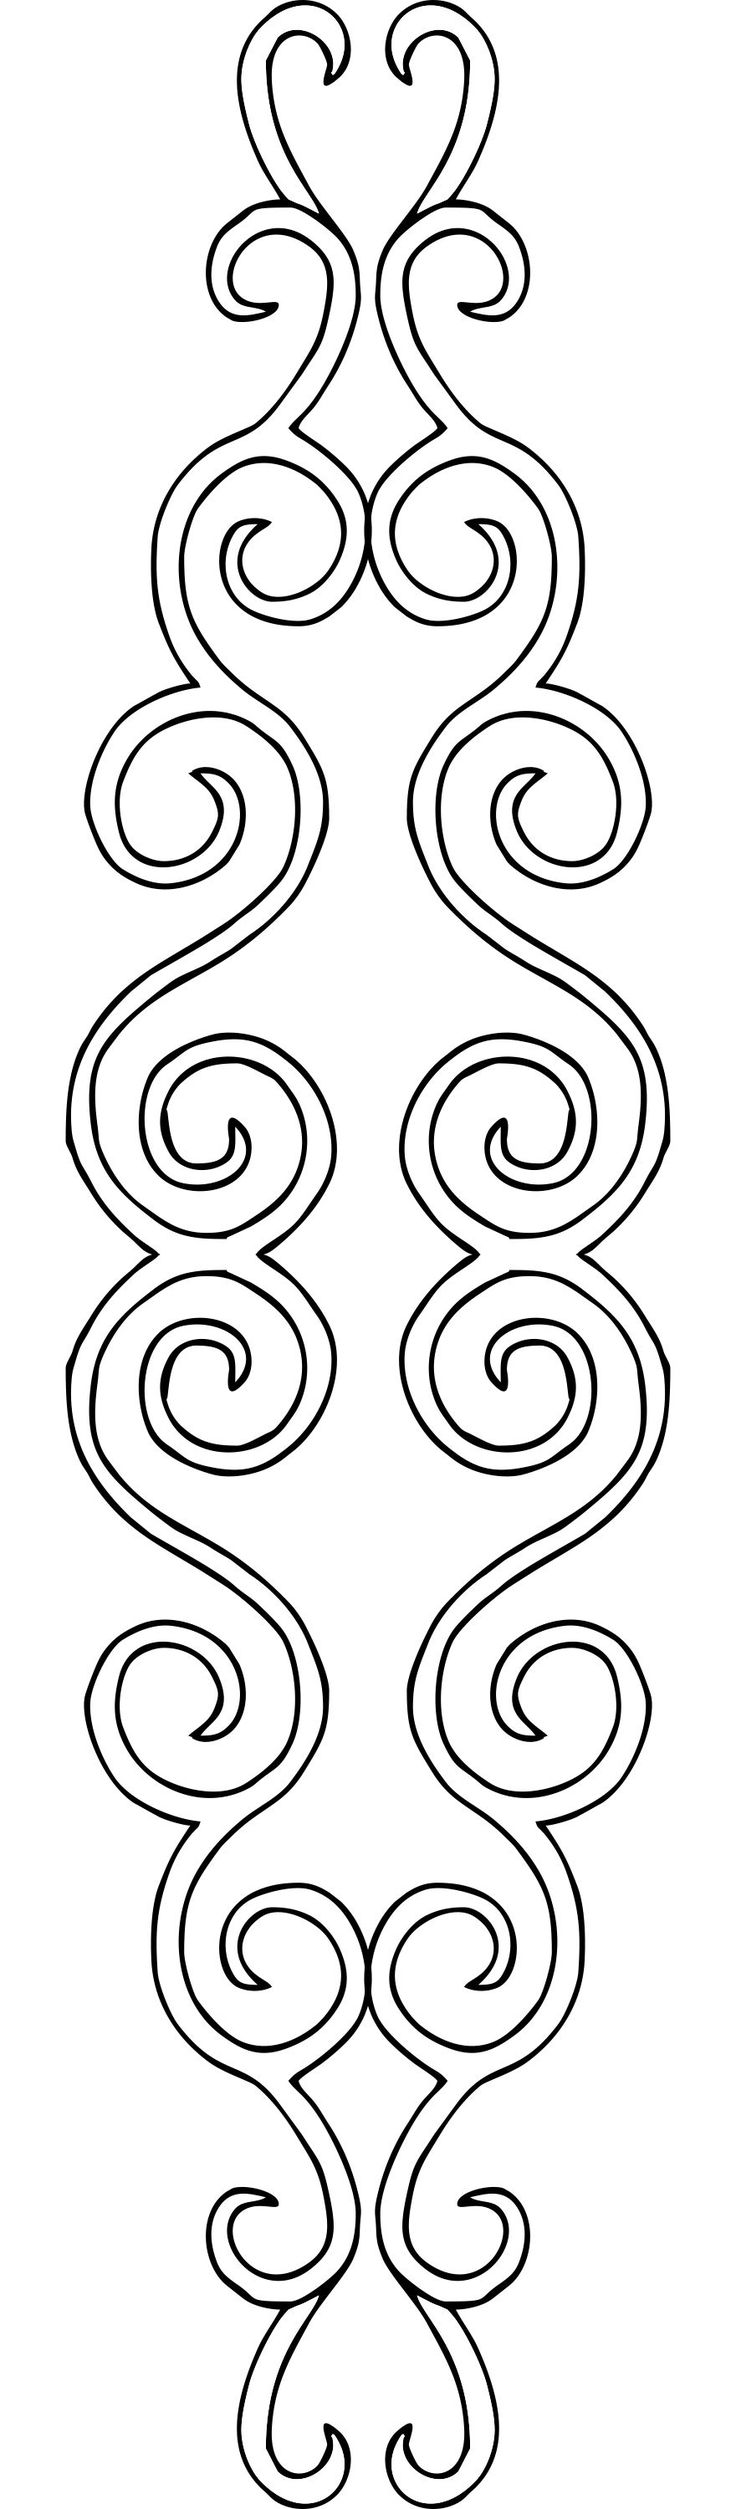 motivo rectangular Más